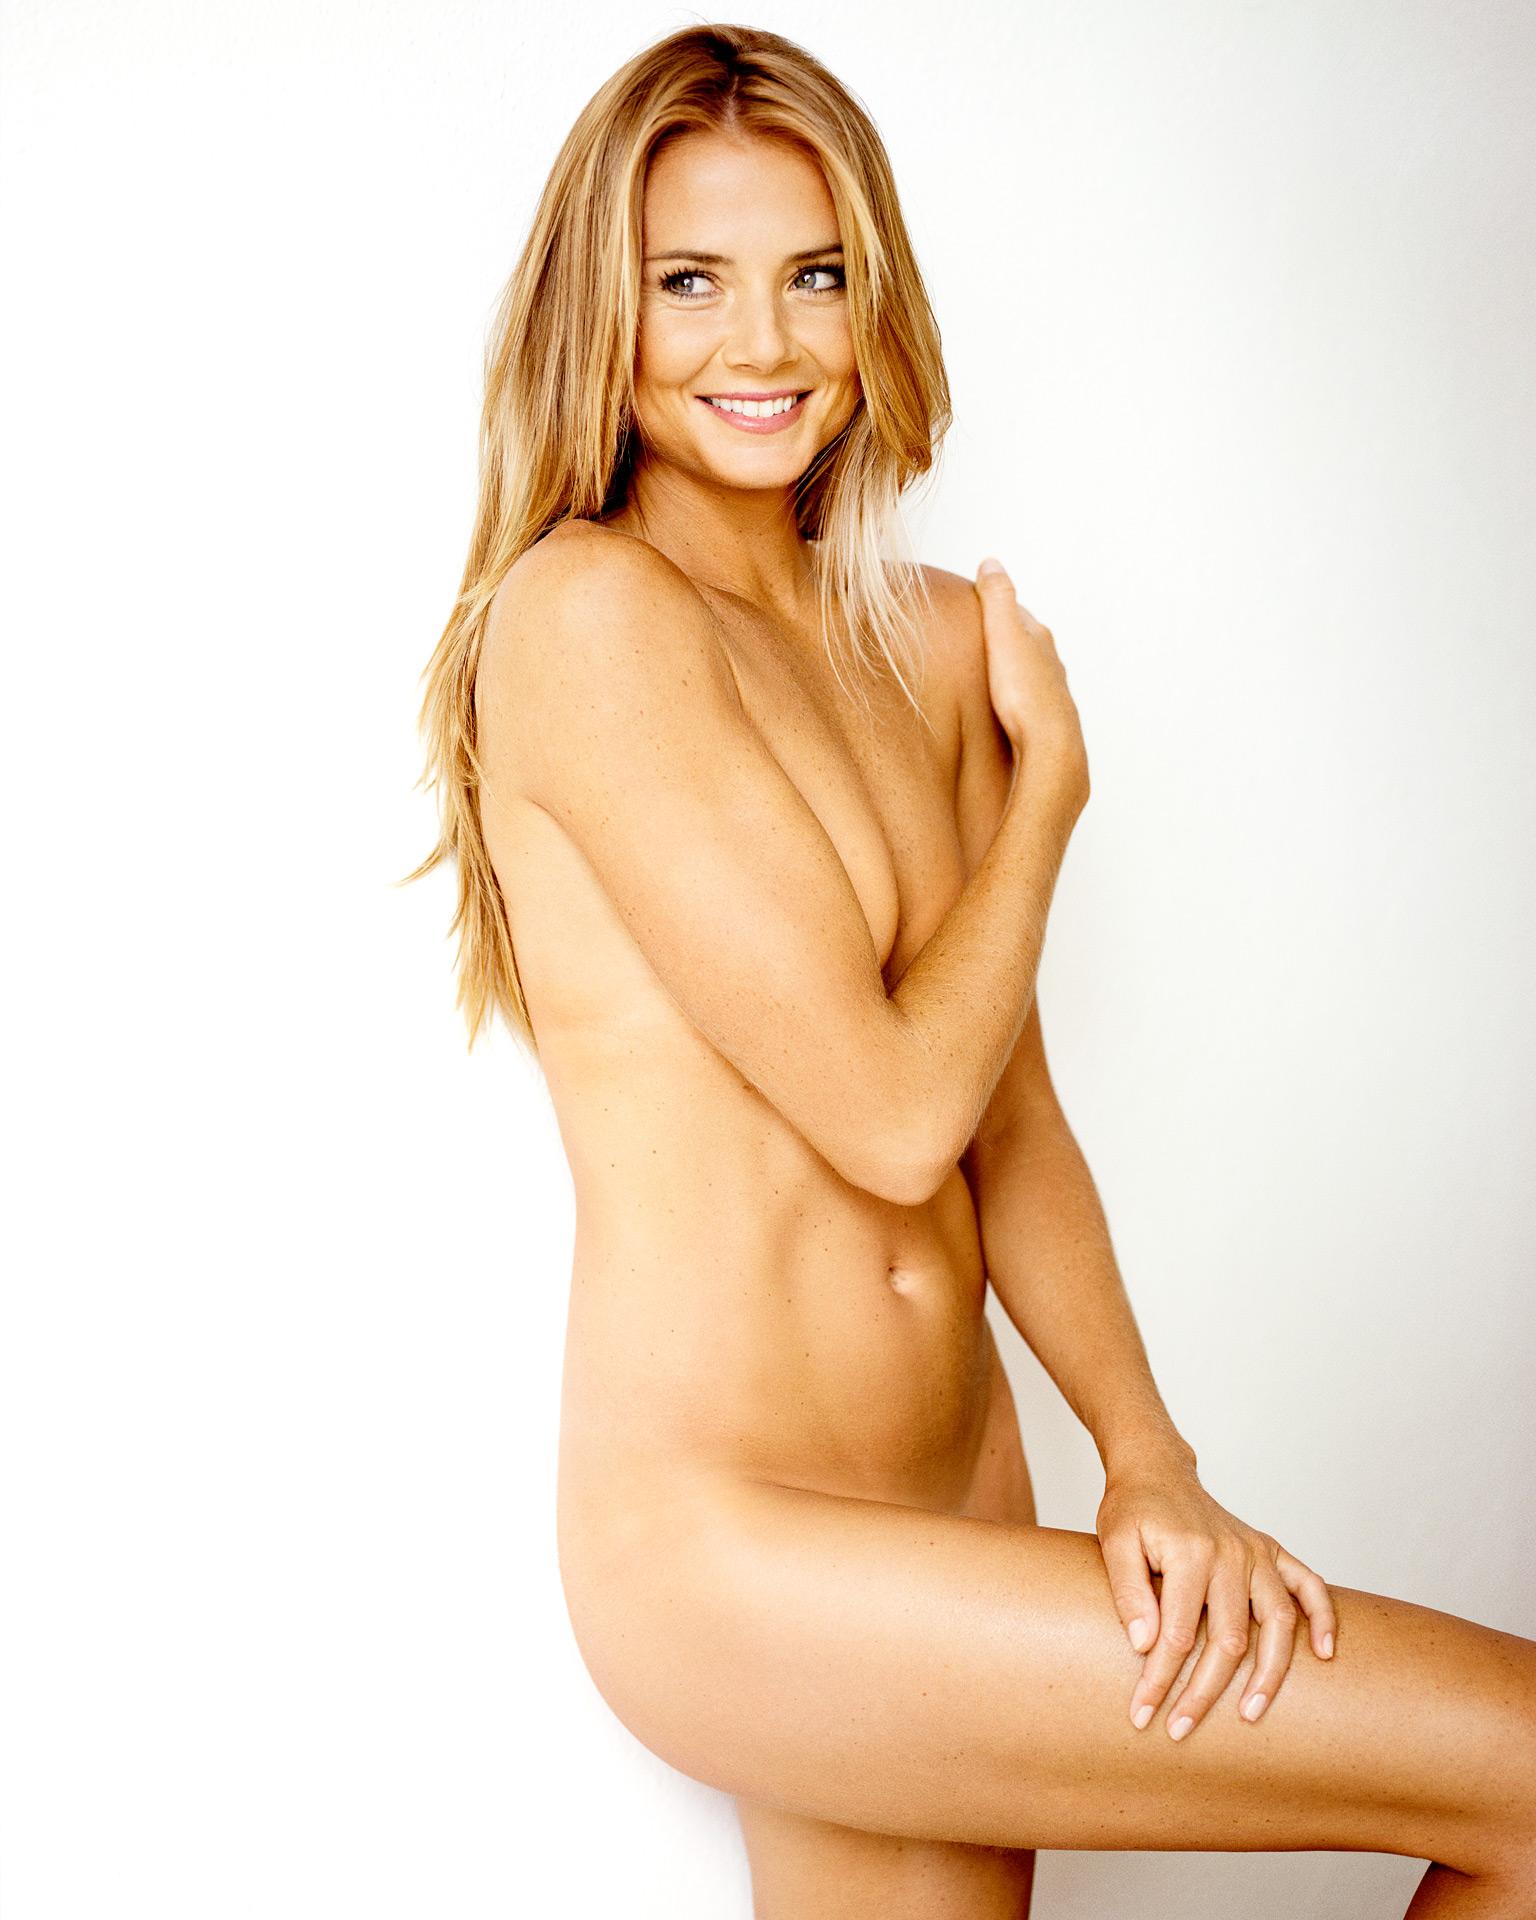 Candice parker bikini